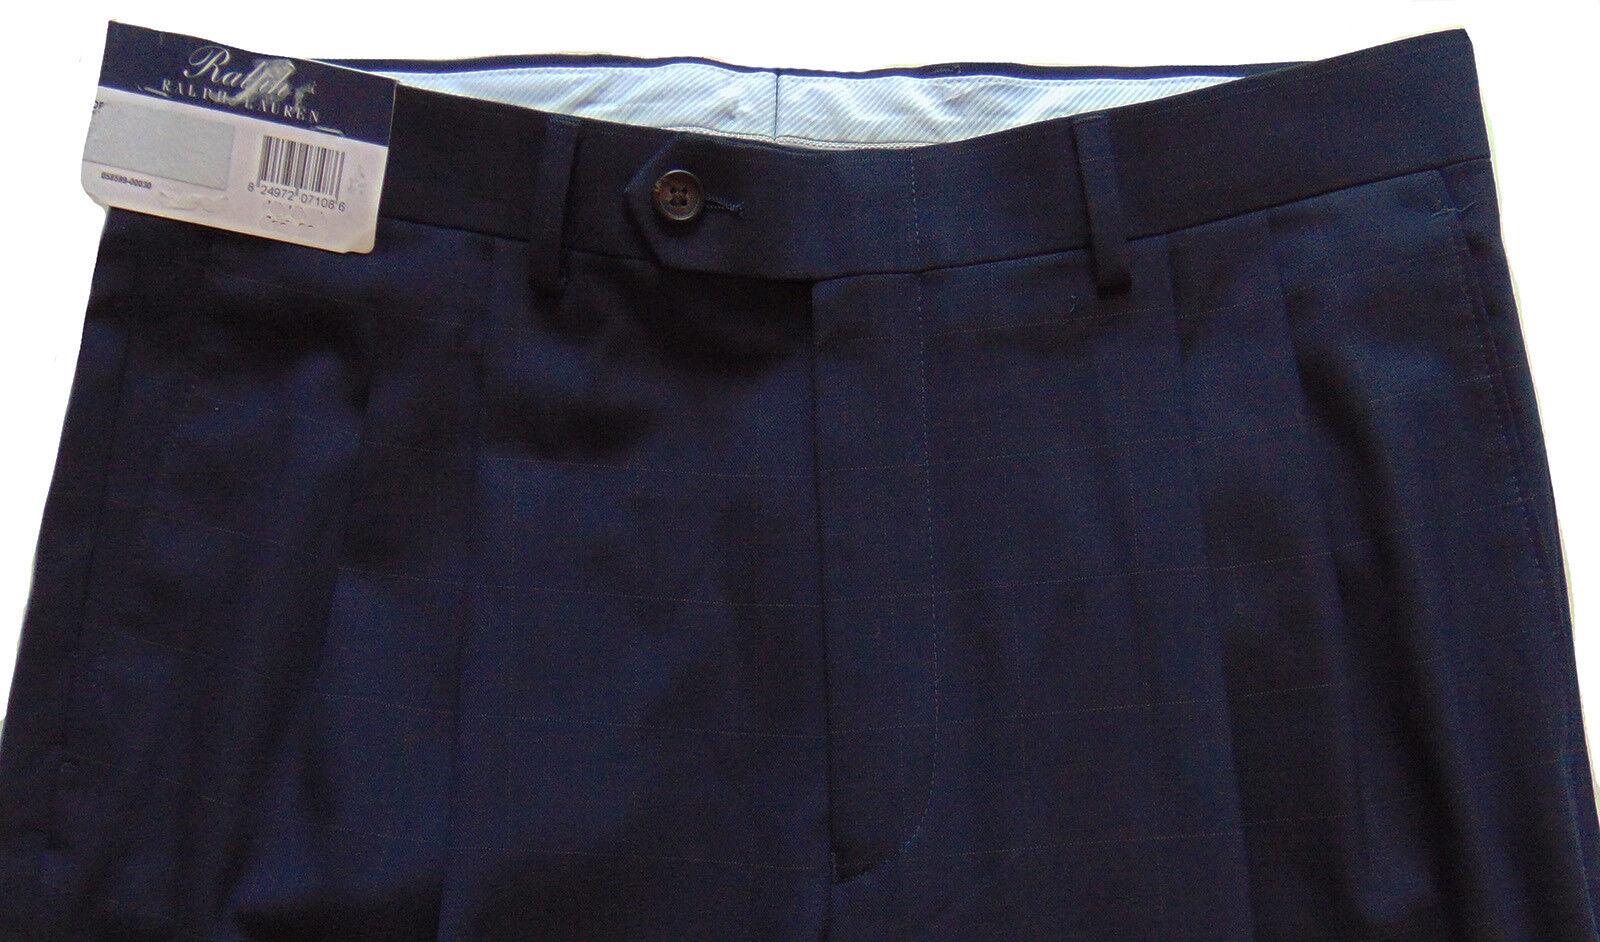 Men's RALPH LAUREN Navy bluee Pleated Plaid Dress Pants 32x32 NWT NEW -009 Nice